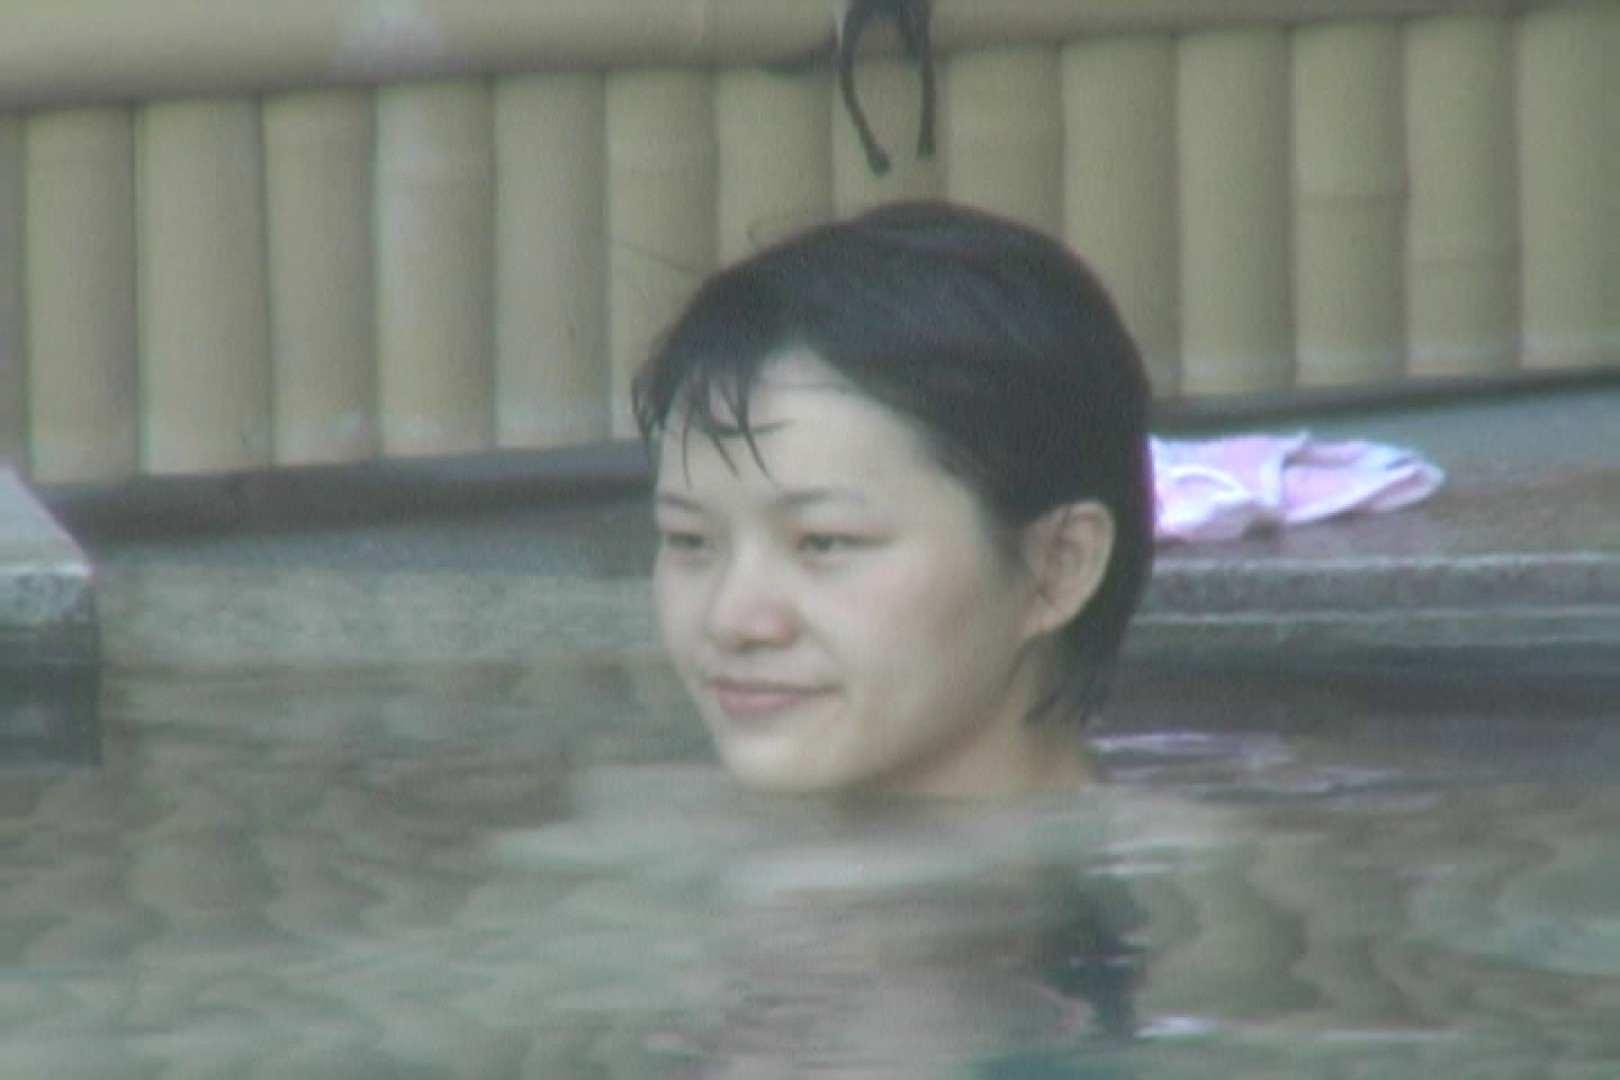 Aquaな露天風呂Vol.116 盗撮映像  42Pix 26